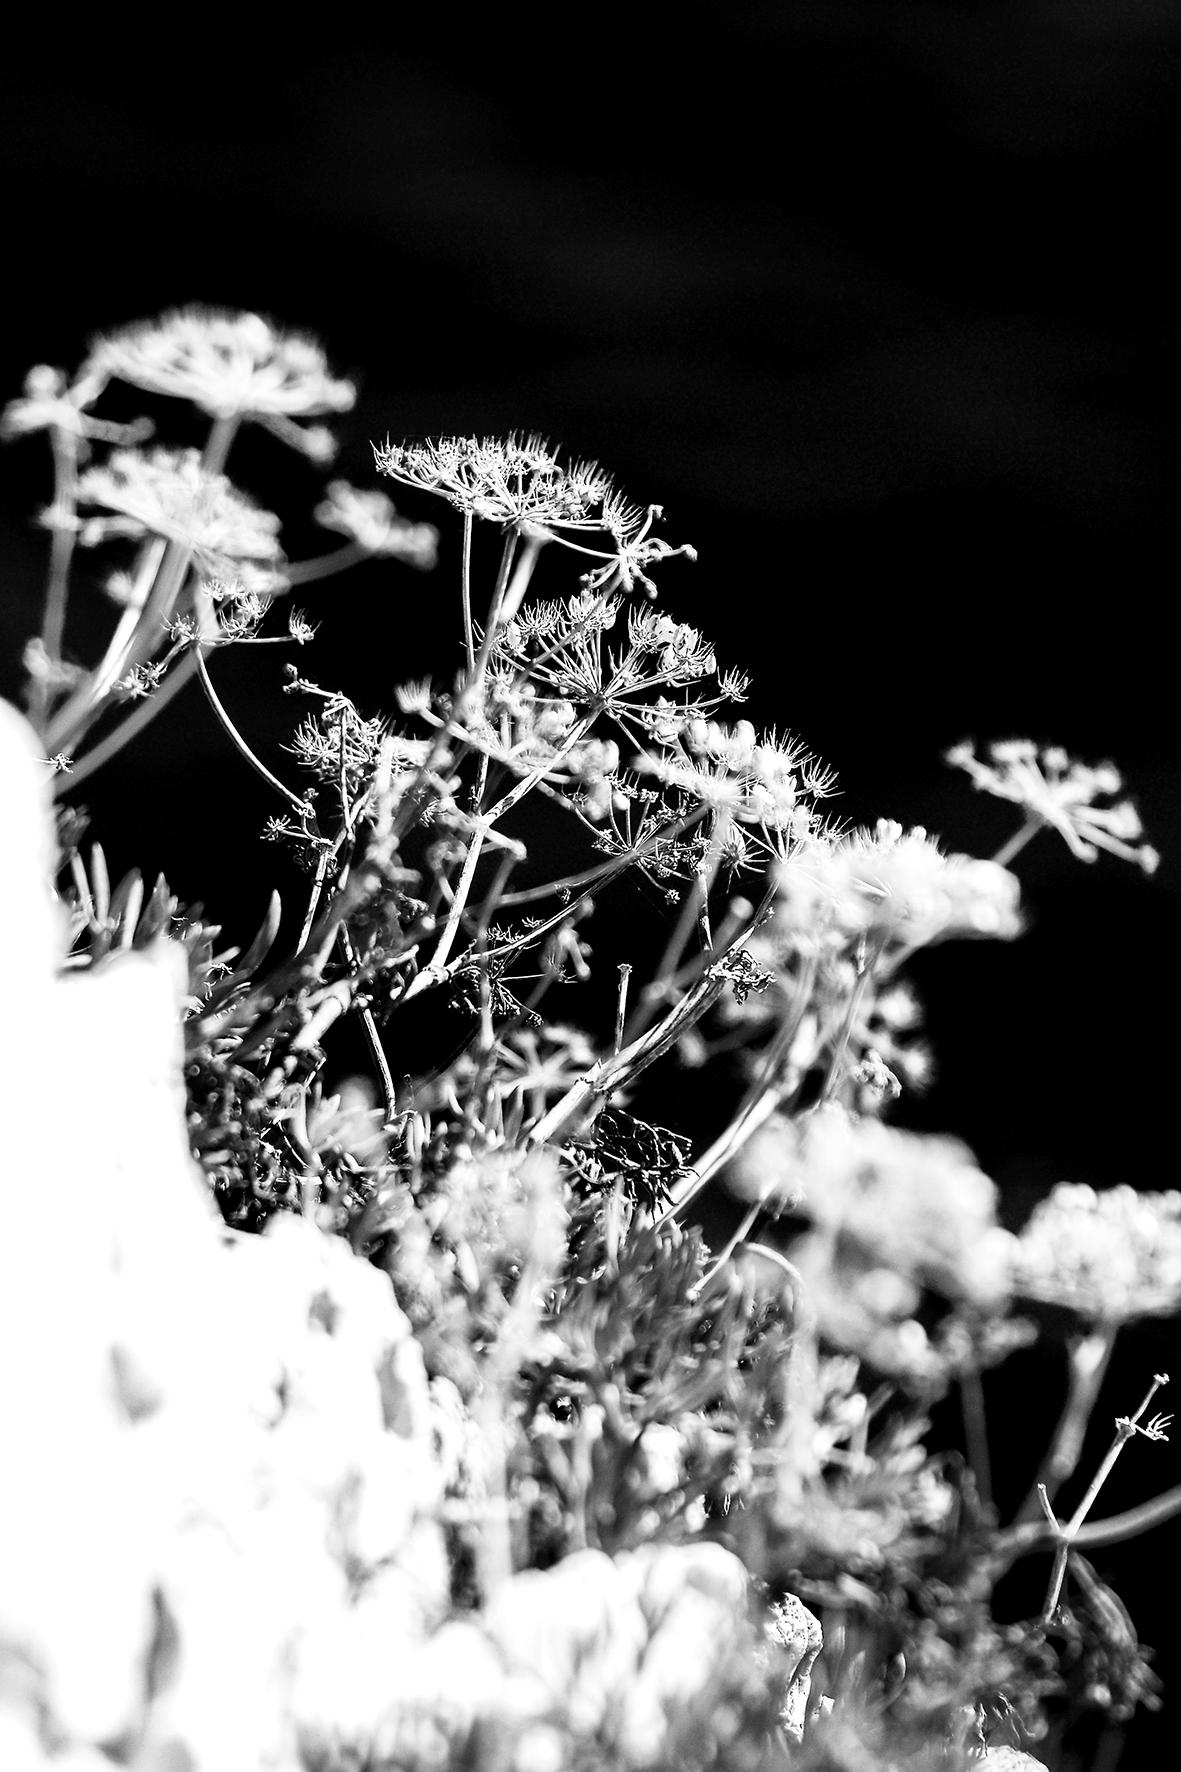 Photographe : Le graphisme naturel n°11